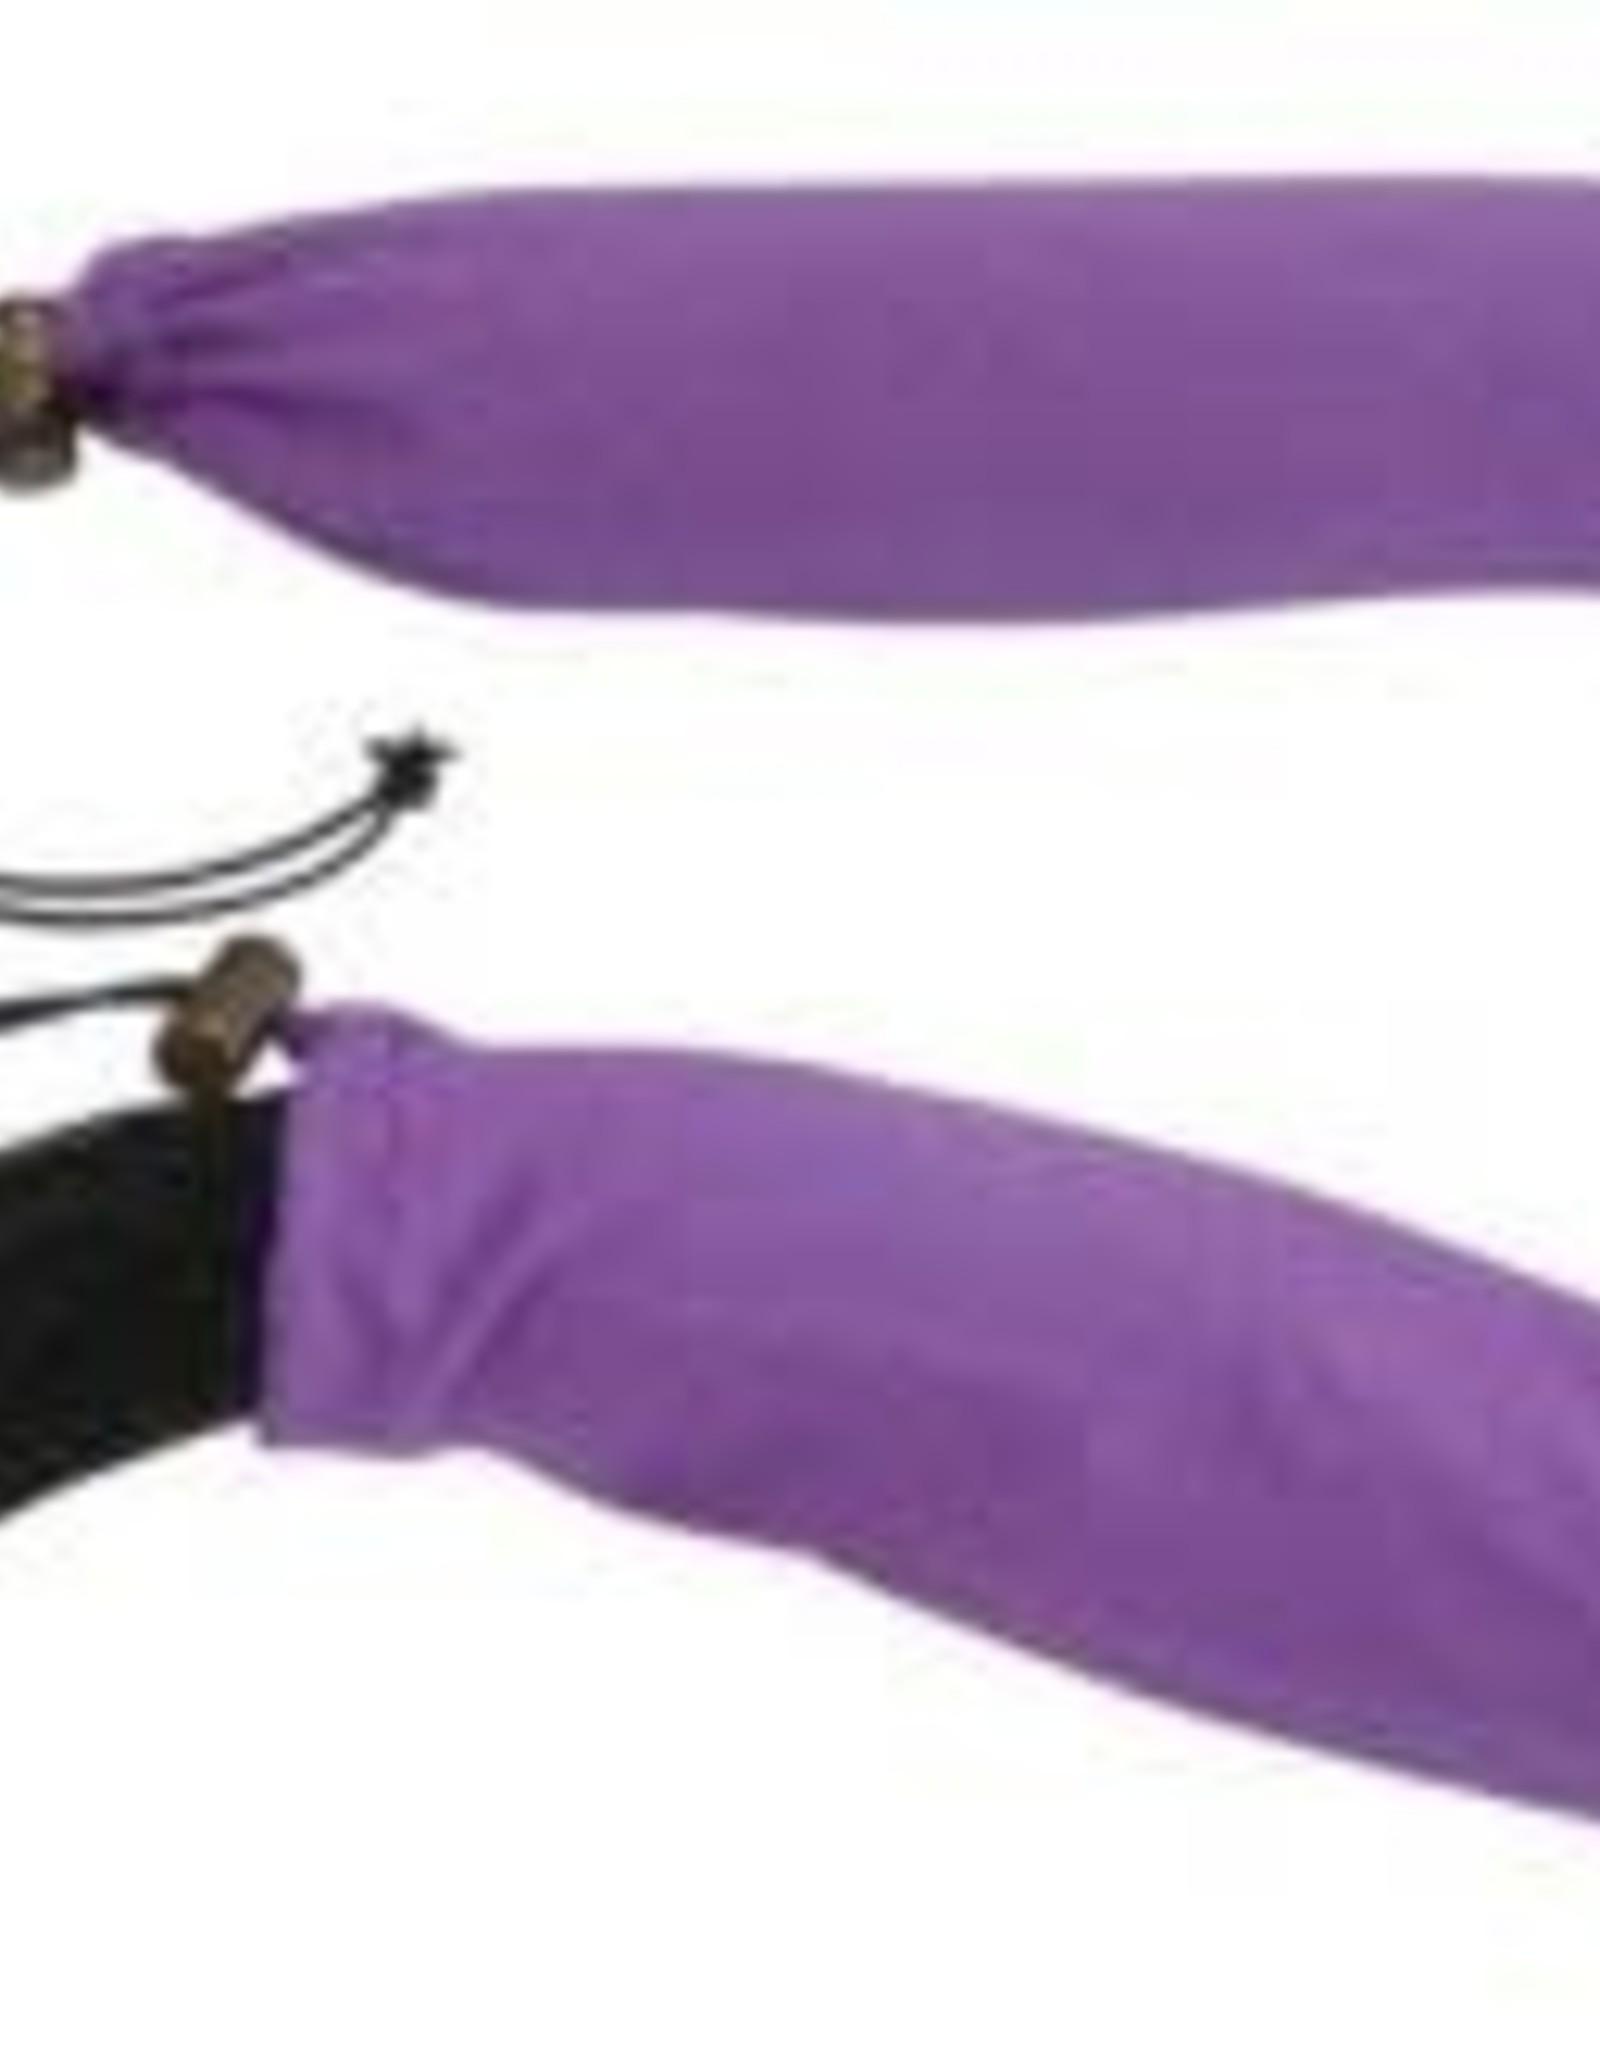 False Tail Storage Sleeve - Pink